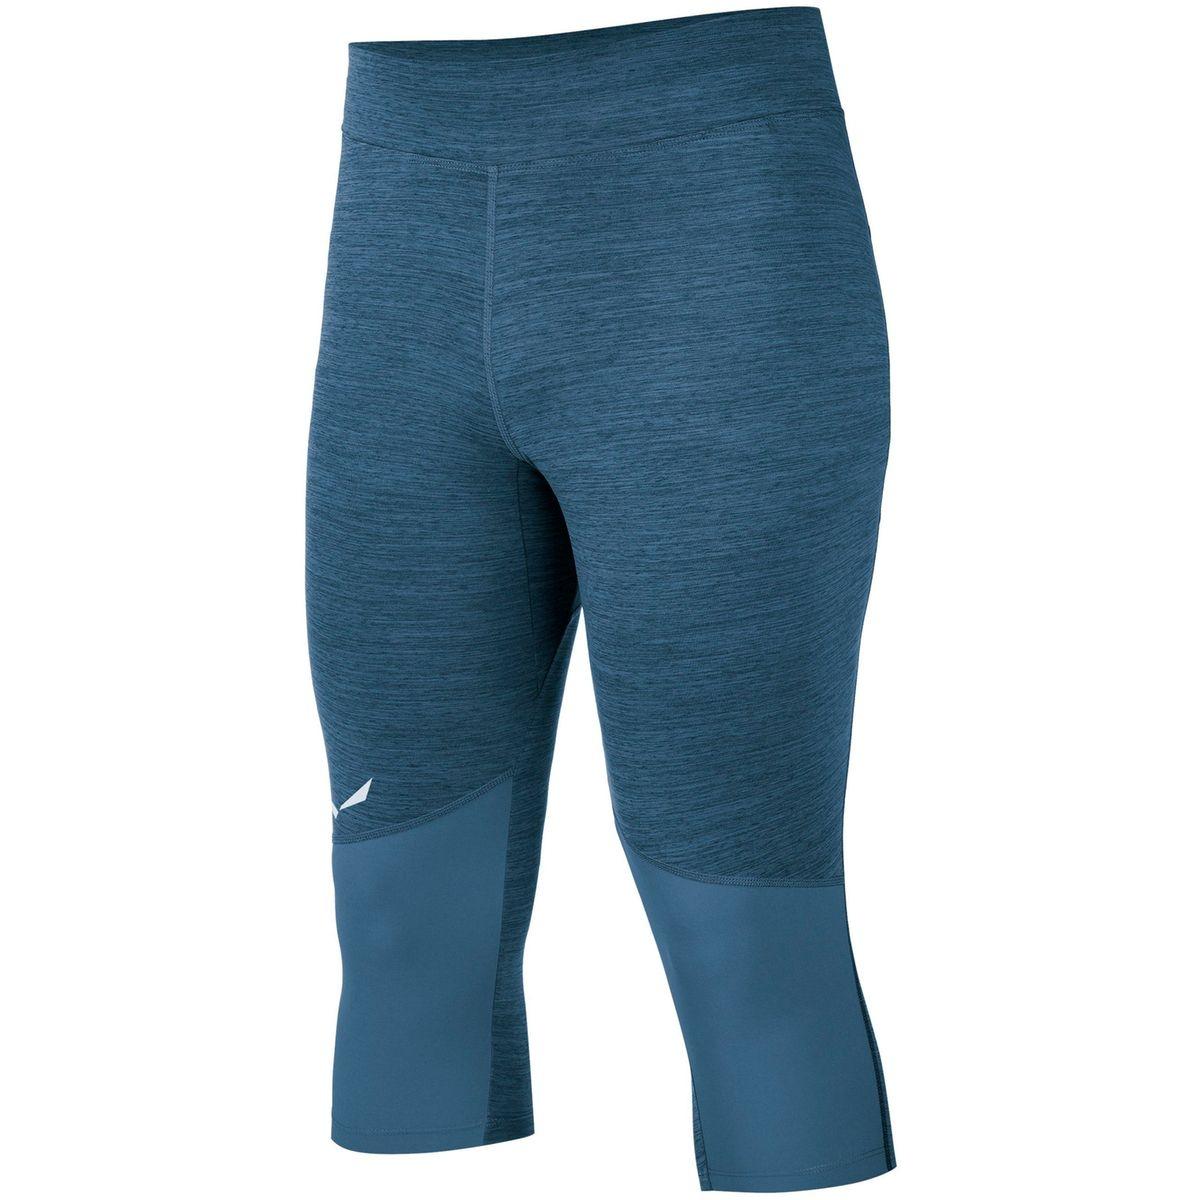 Pedroc Dry - Shorts Homme - bleu